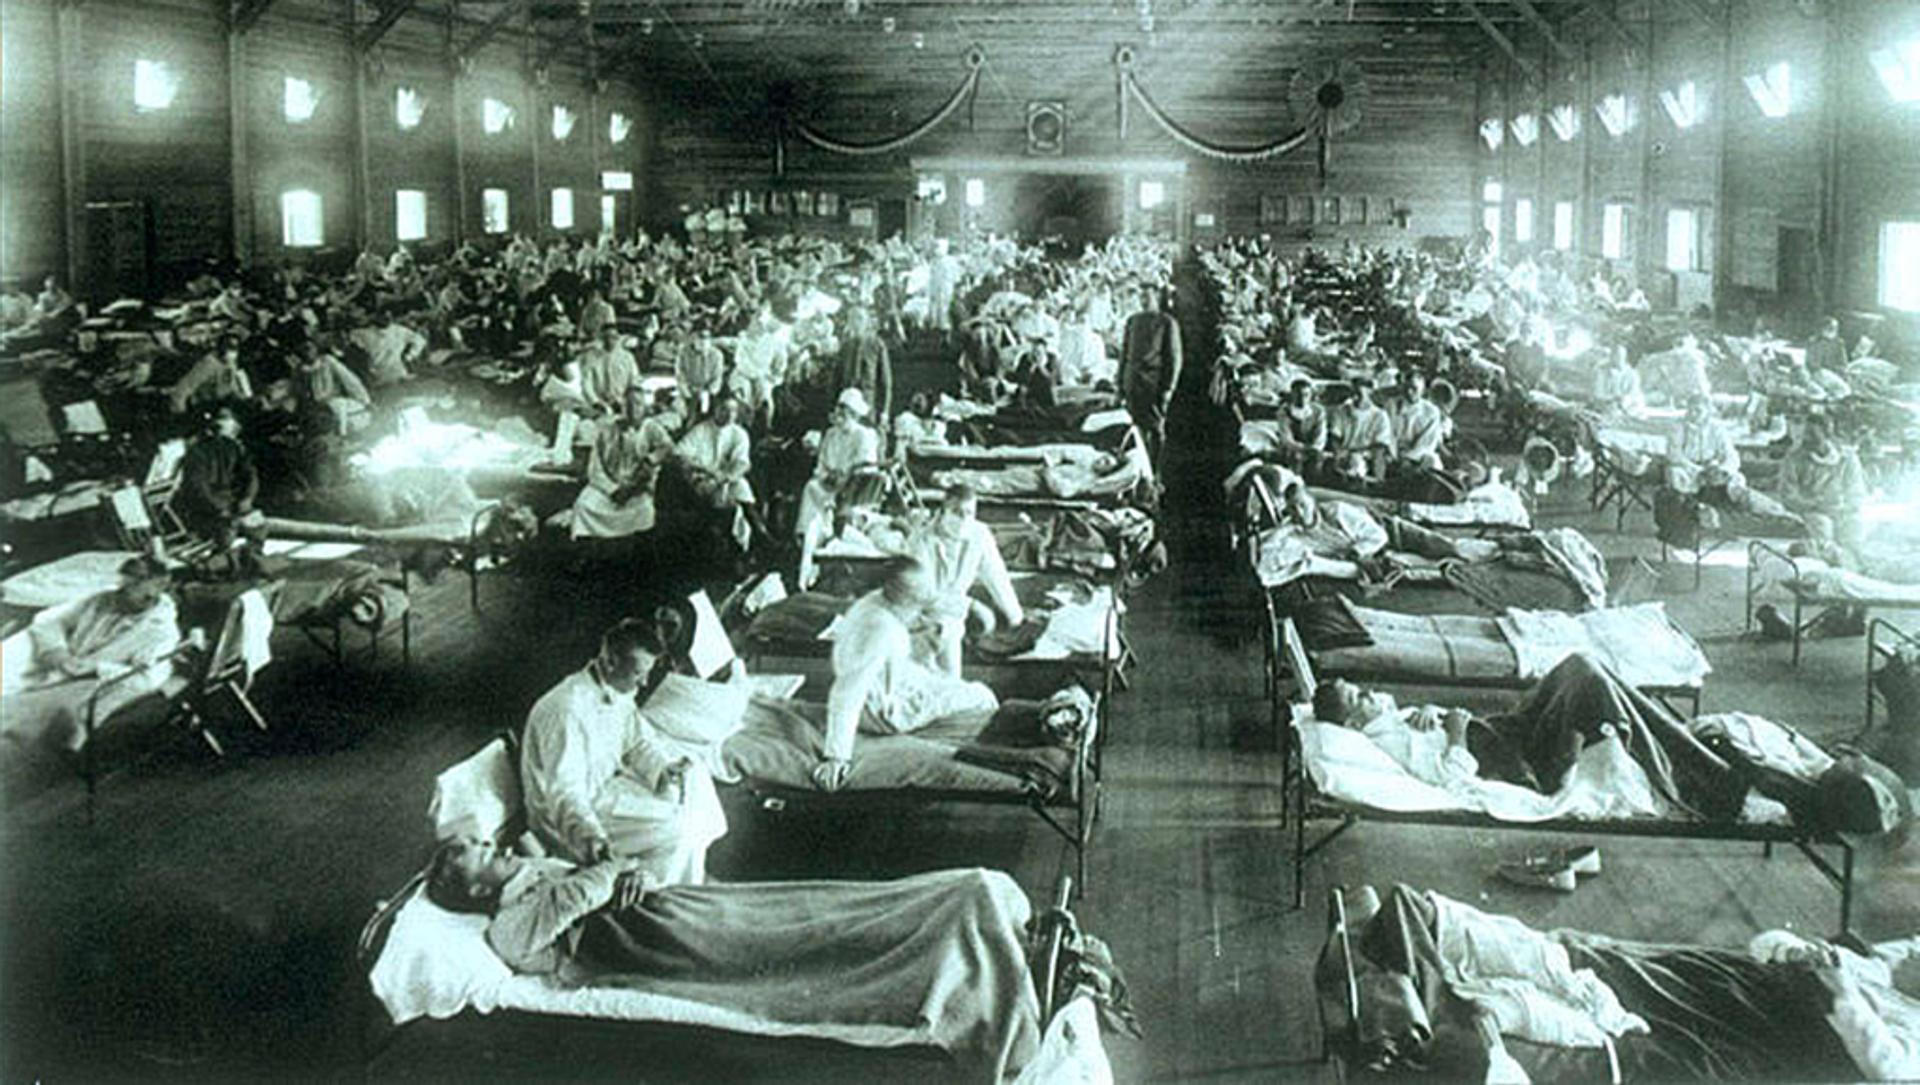 Pandemia de 1918 - Sputnik Mundo, 1920, 13.03.2020